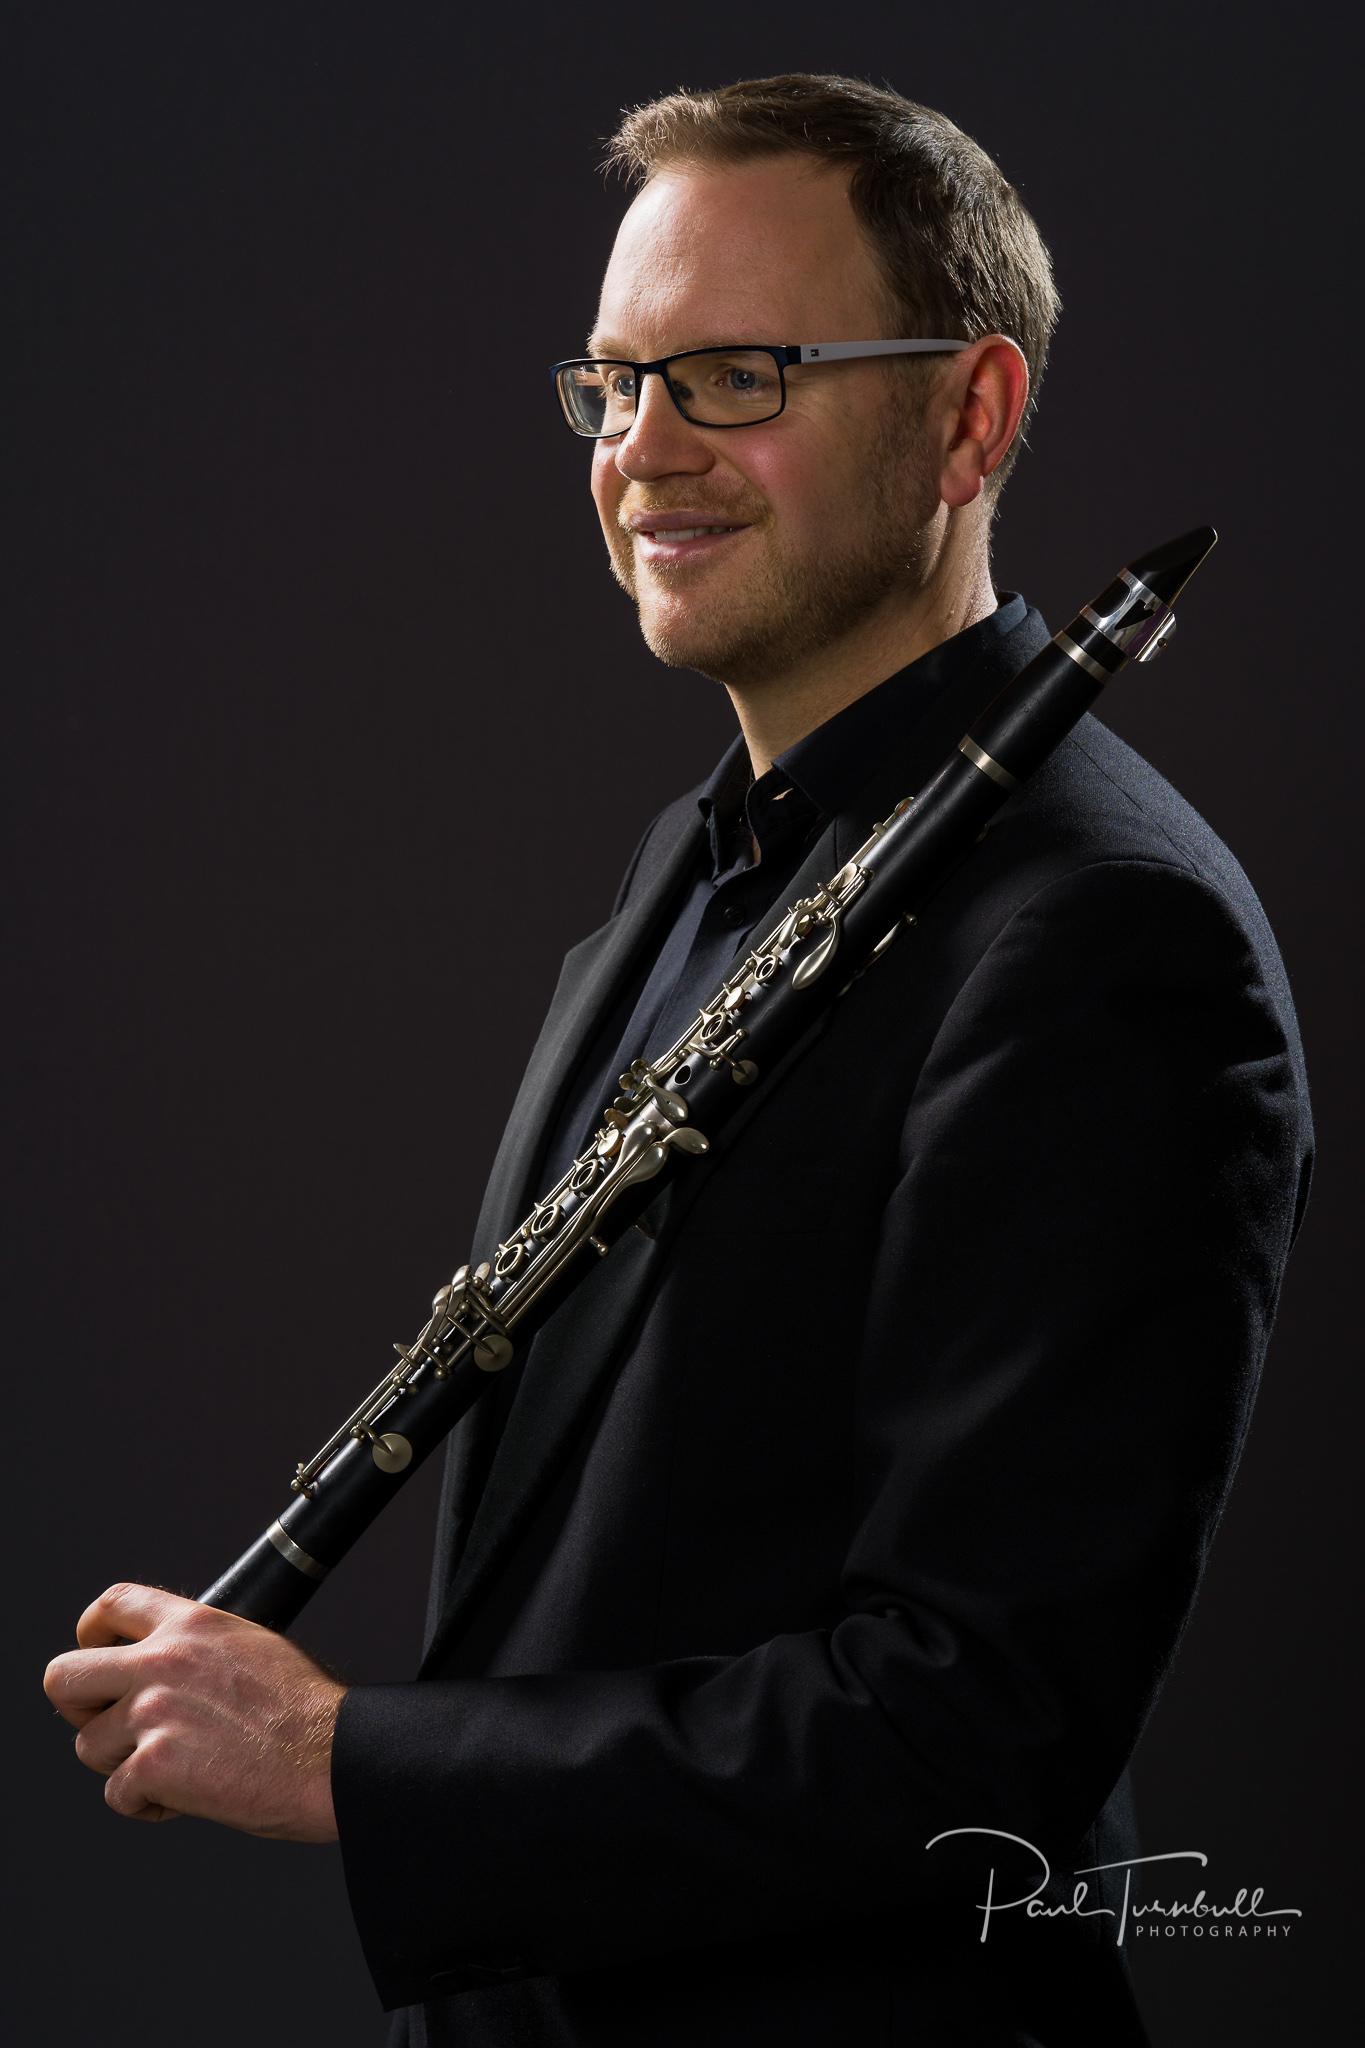 musician-headshot-portrait photographer-leeds-yorkshire-007.jpg